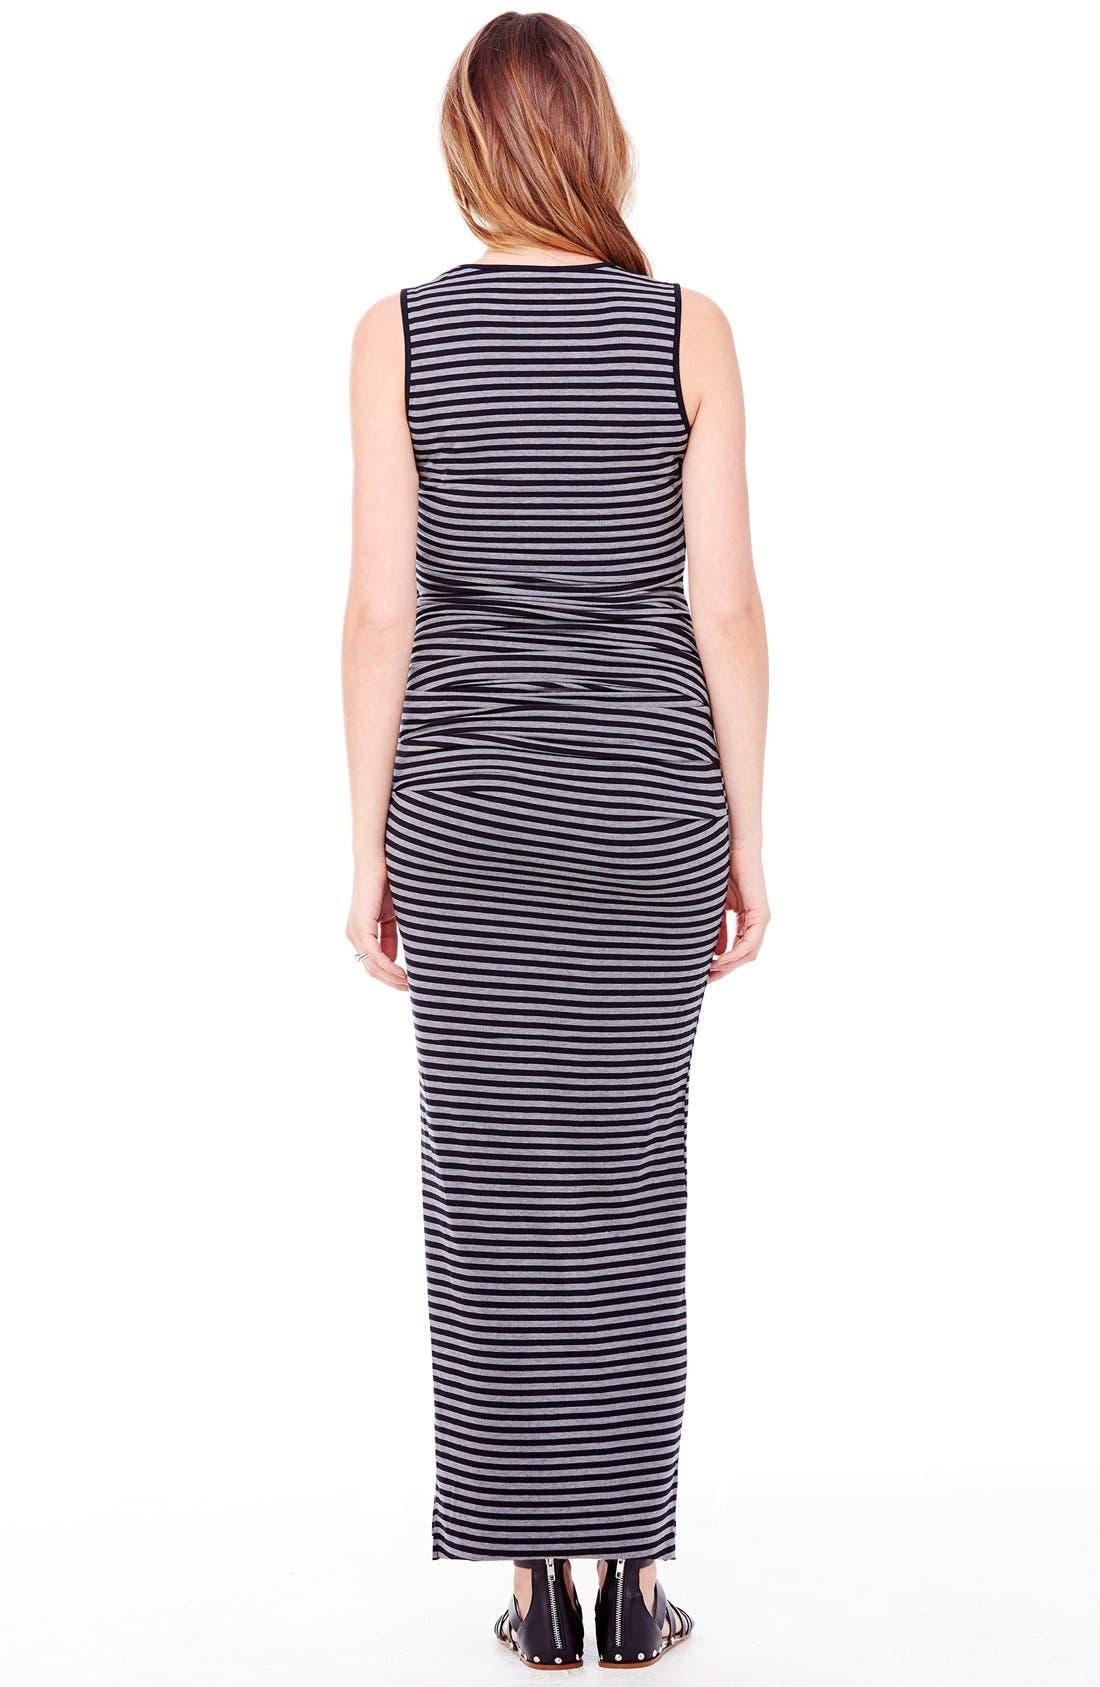 Striped Tank Maternity Maxi Dress,                             Alternate thumbnail 2, color,                             Black/ Heather Grey Stripe